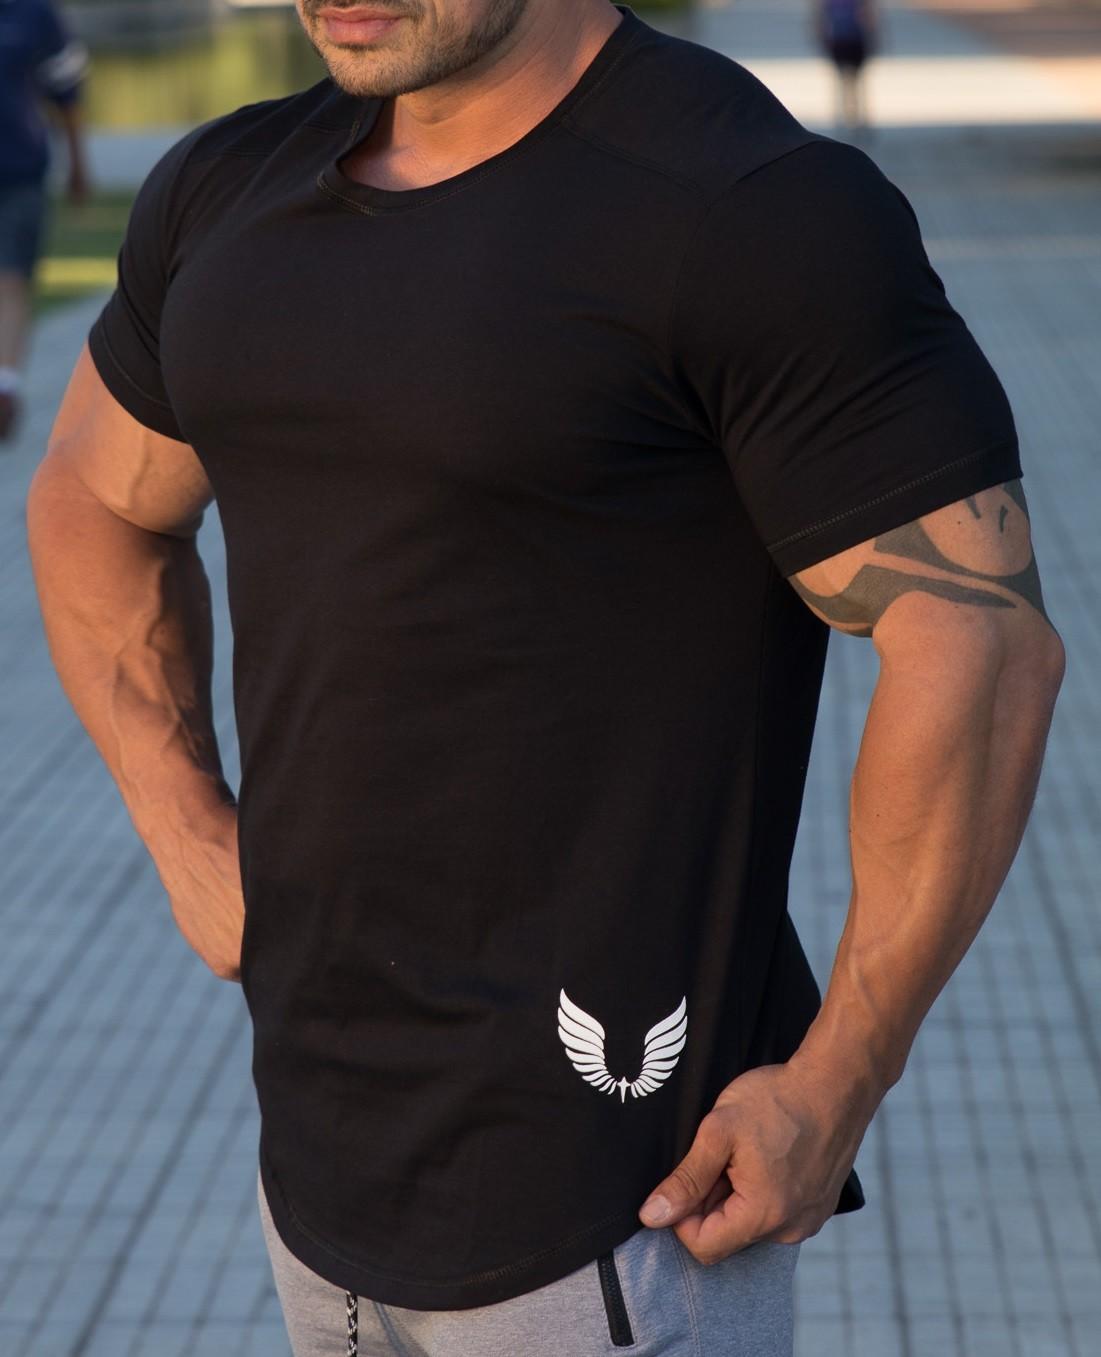 Camiseta Masculina Estampada Longline Manga Curta